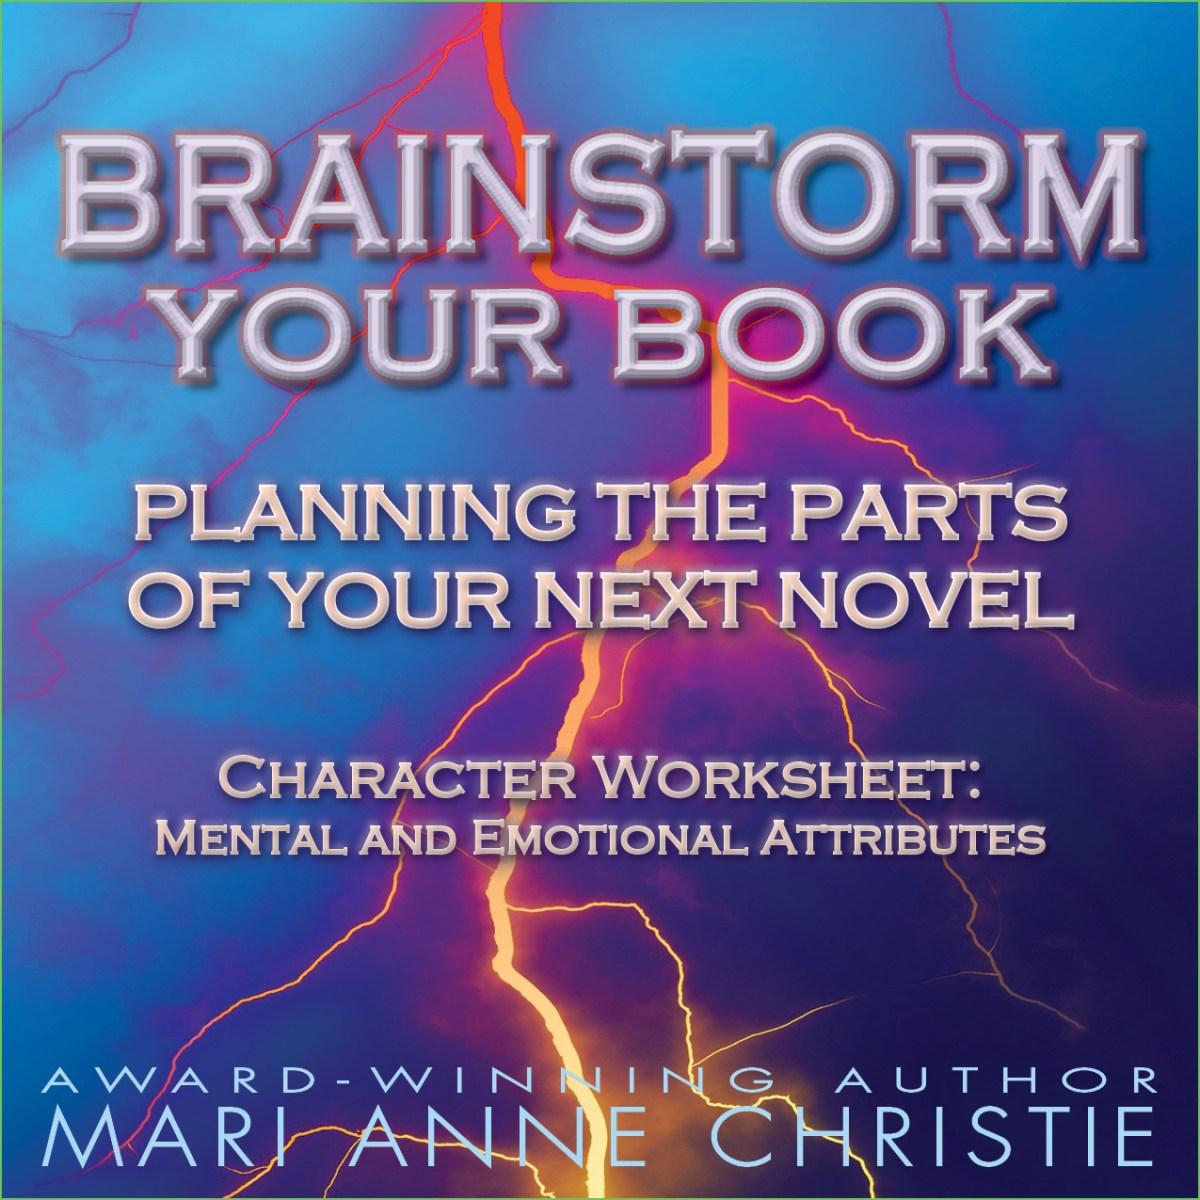 Character Worksheet - Mental and Emotional Attributes